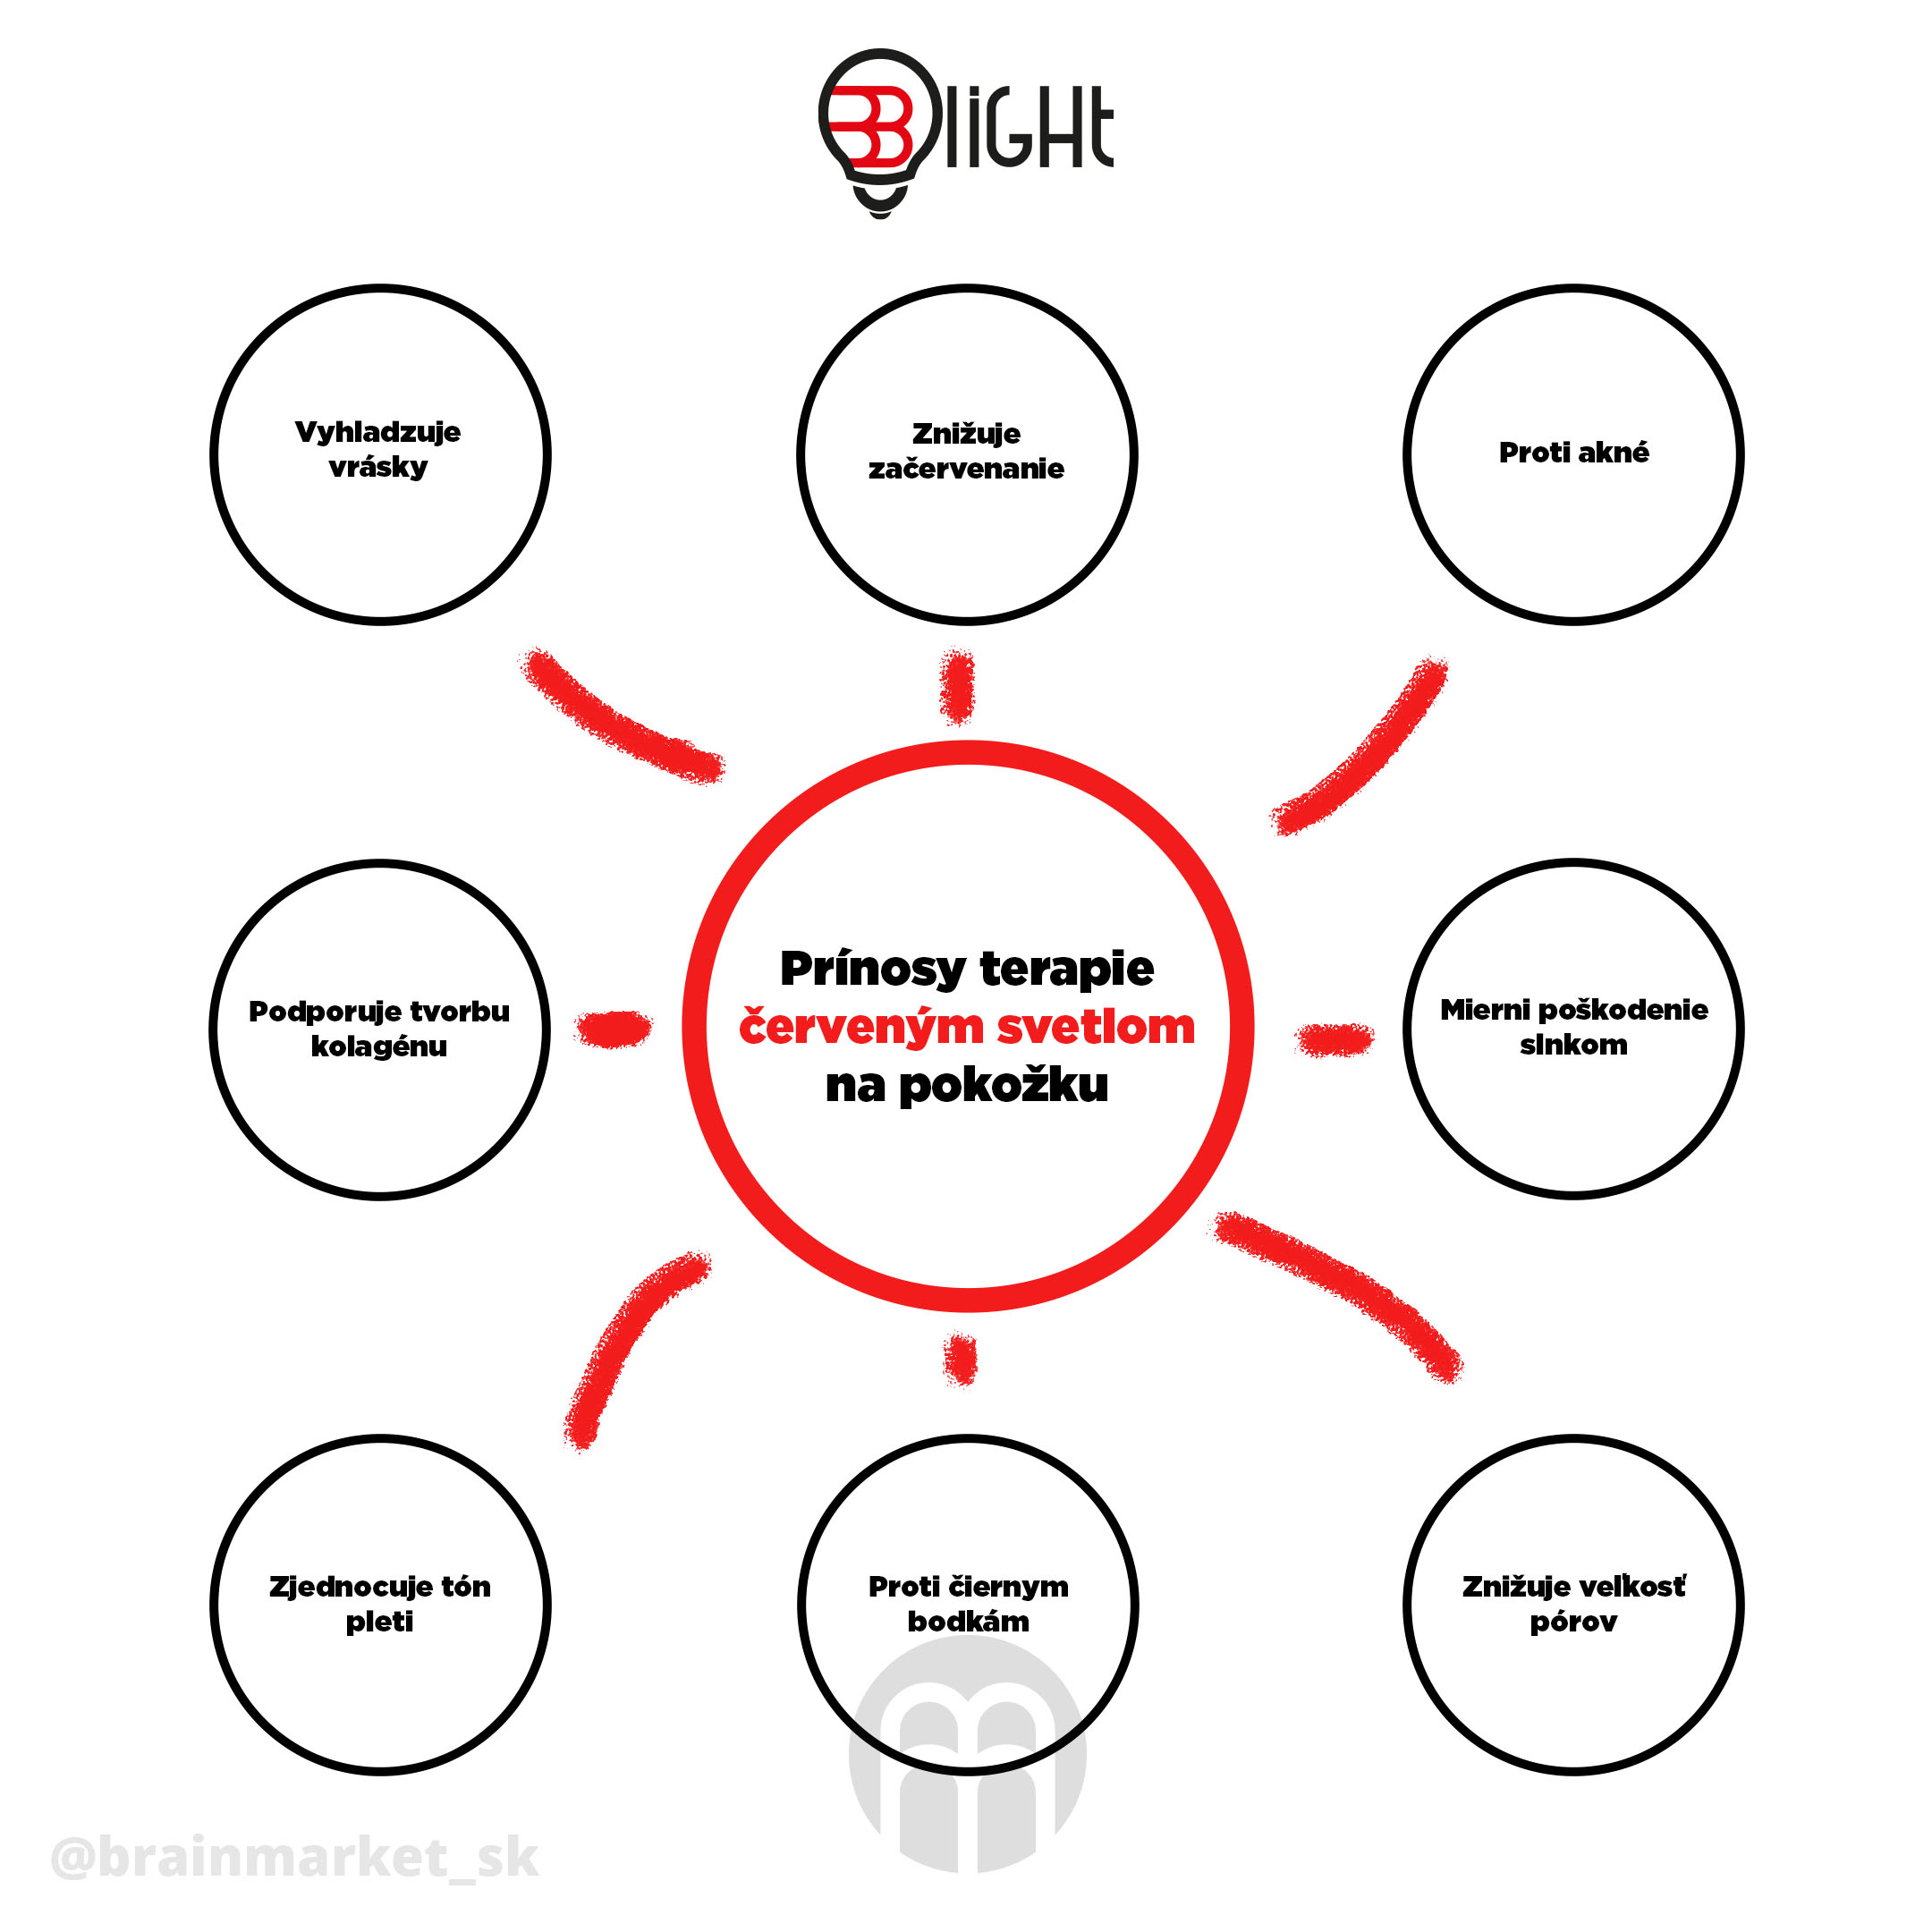 terapie-cervenym-svetlem-infografika-brainmarket-sk